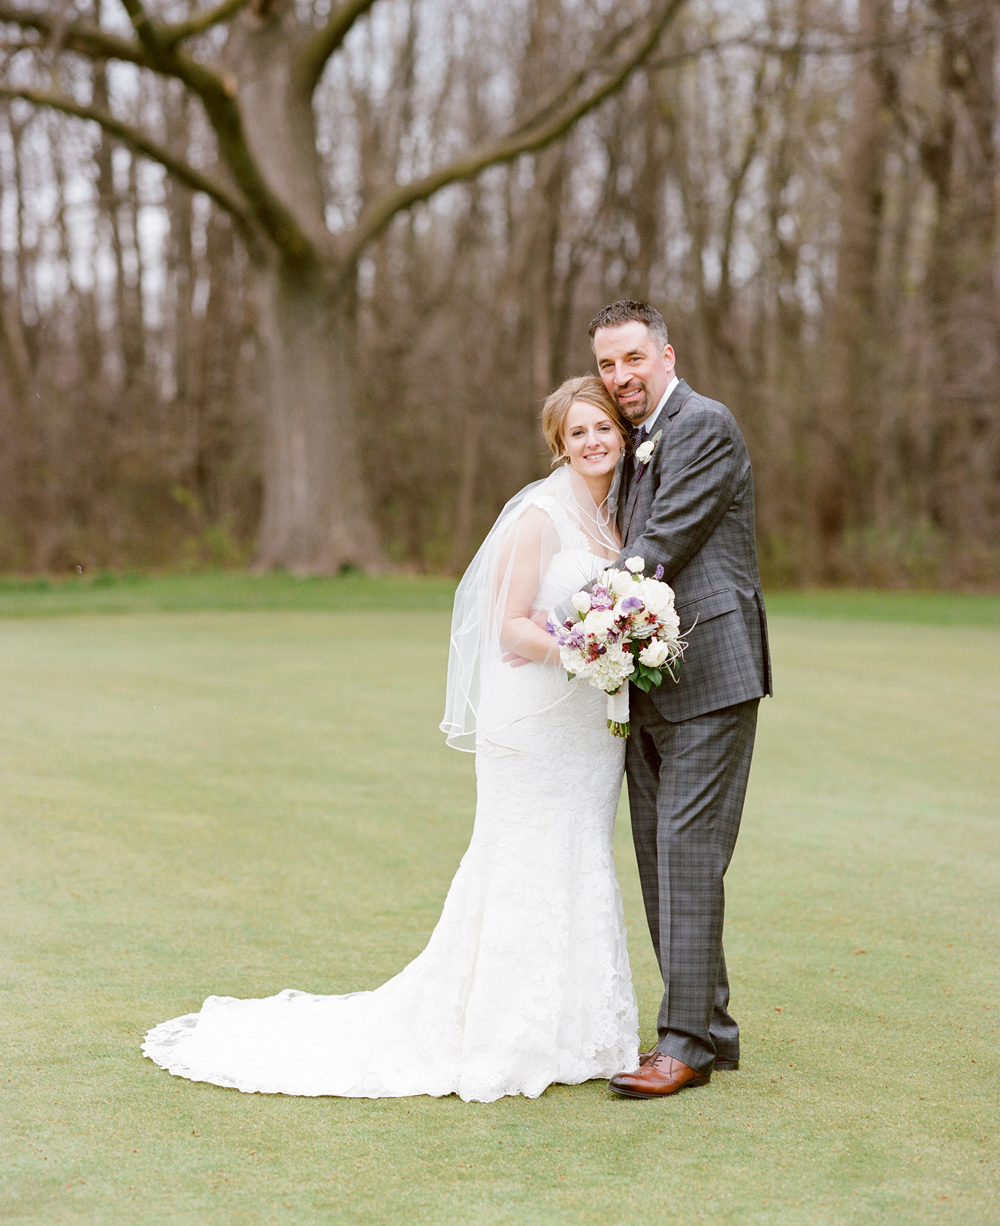 North_Shore_Golf_Club_Wedding_Photography_021.jpg